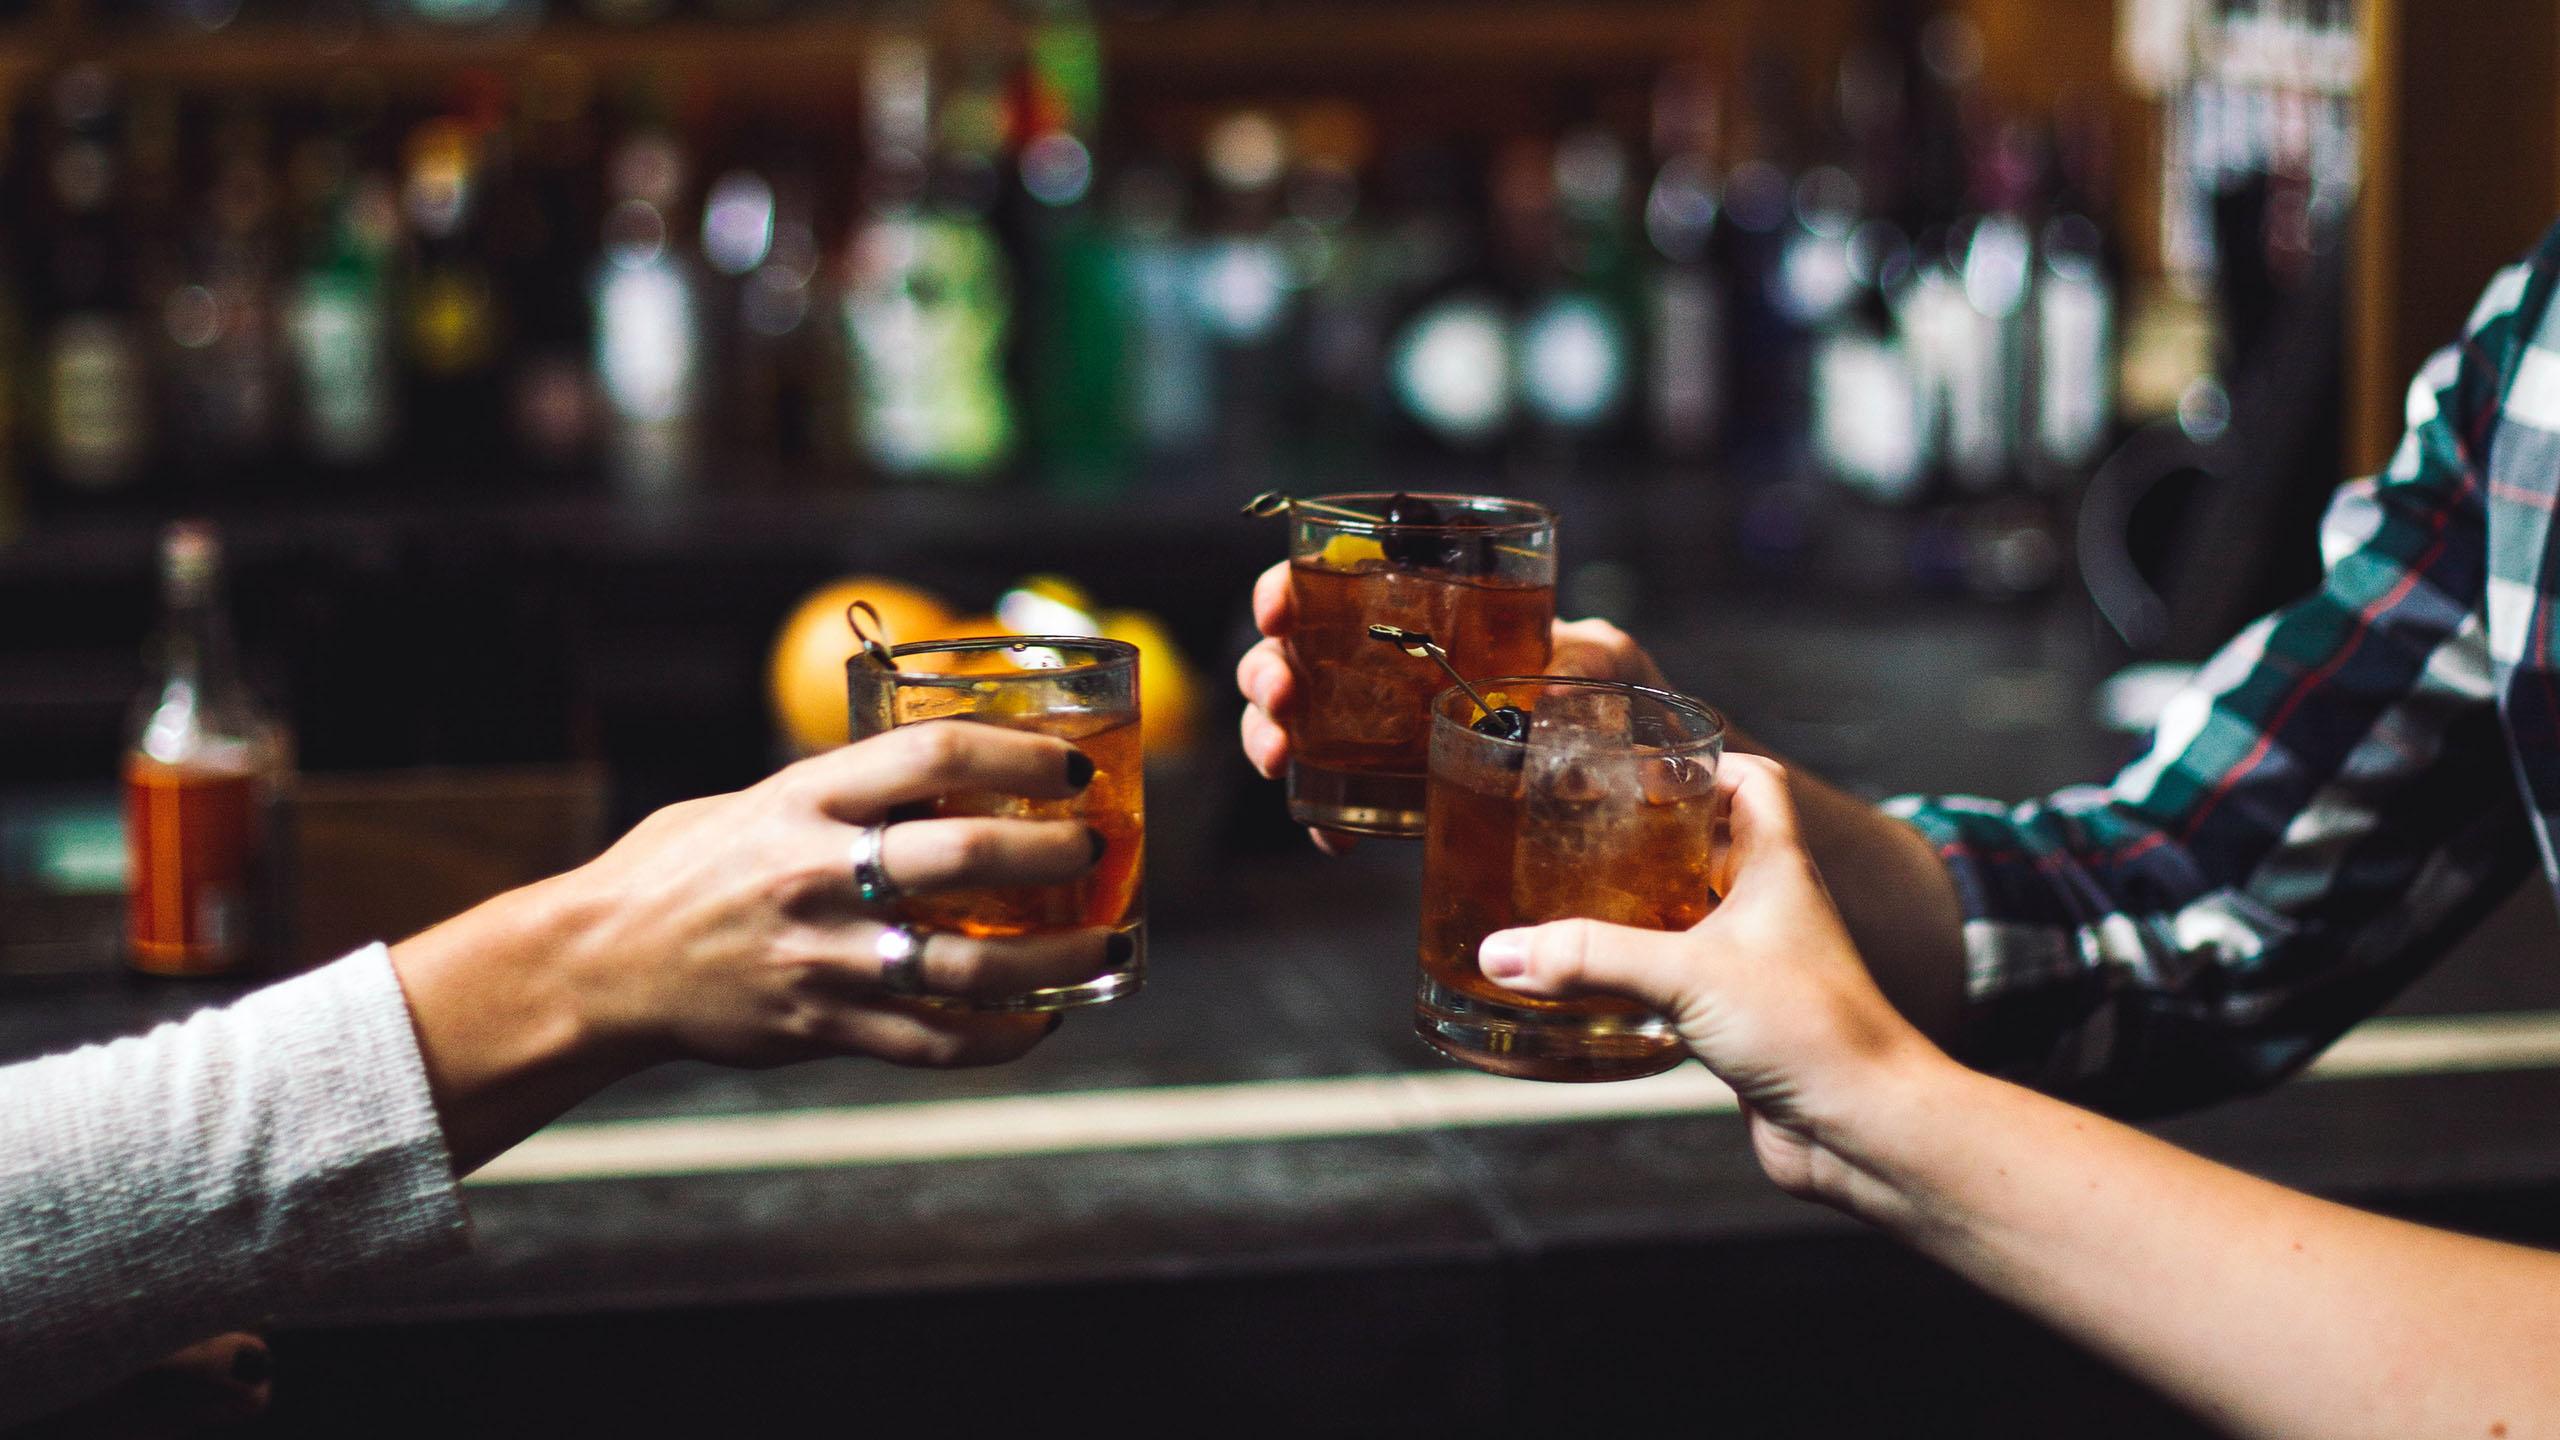 coctelería, mixología, competencia